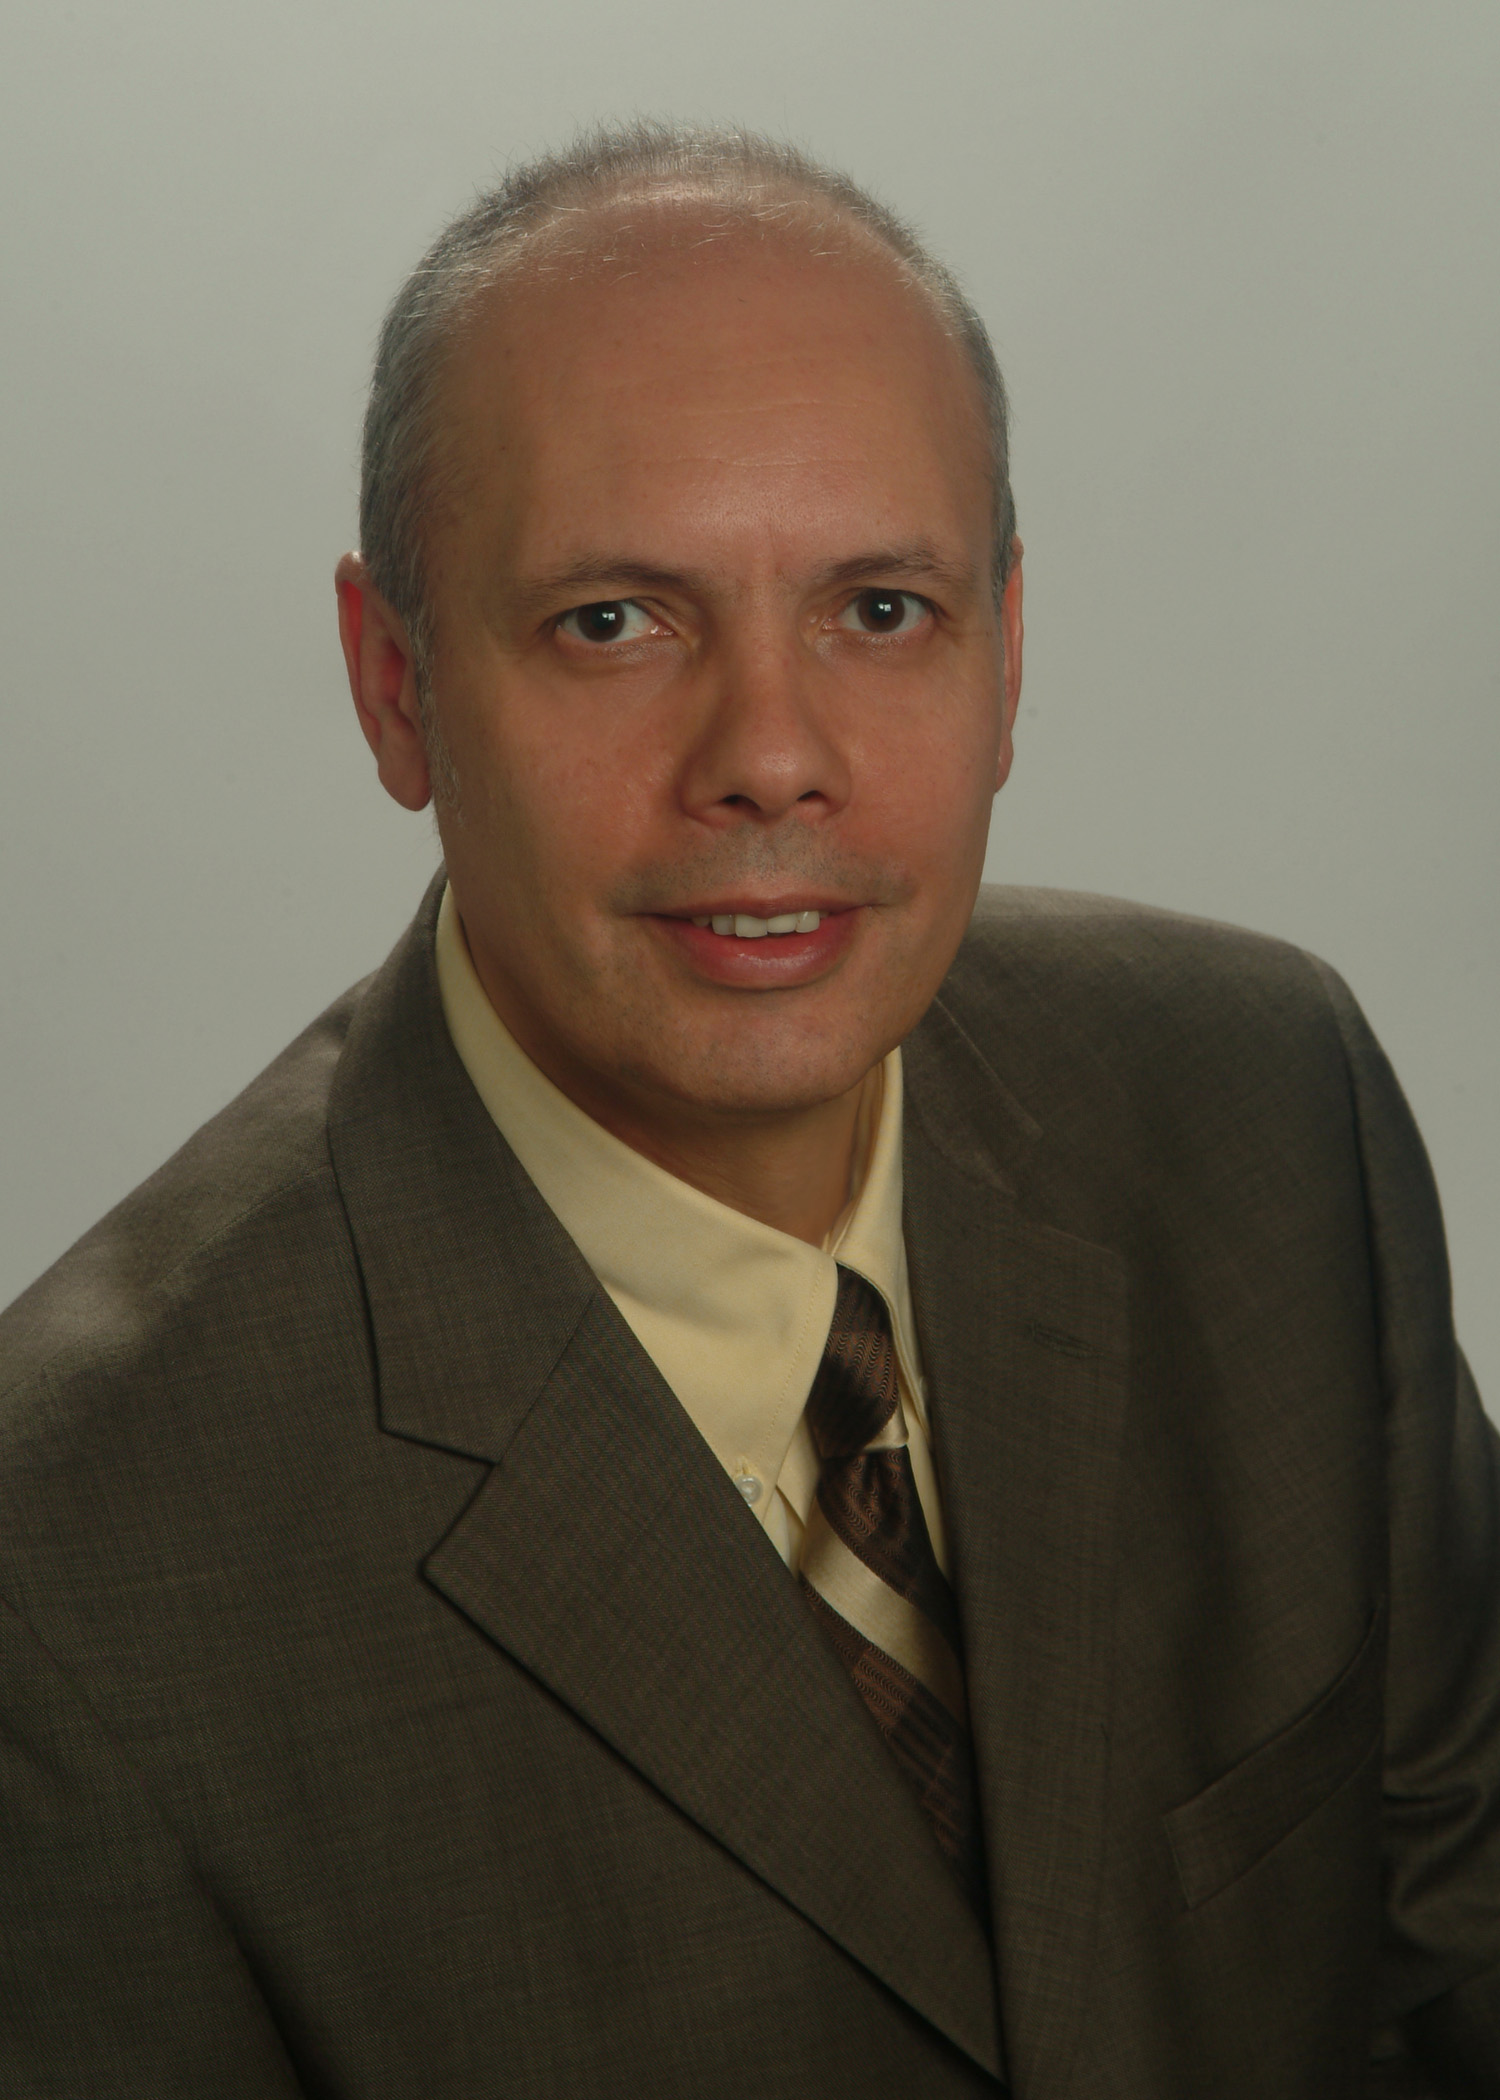 Mike Azimi